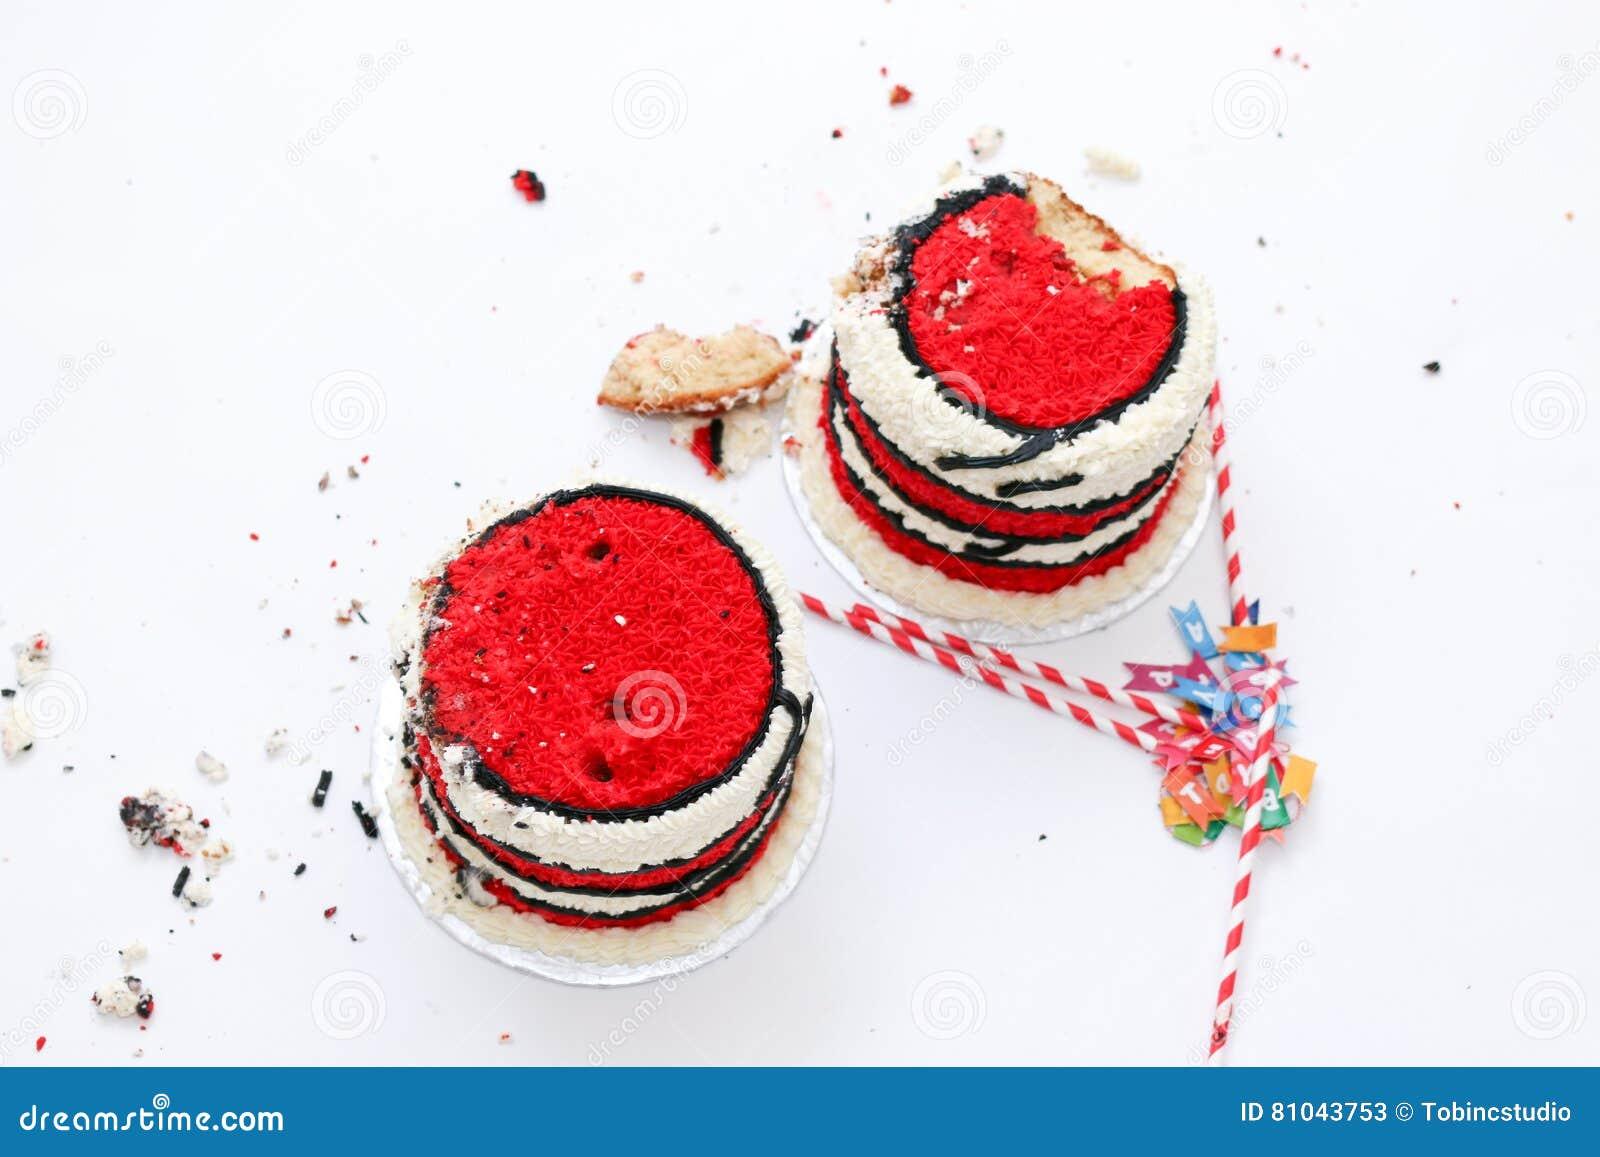 Fantastic Twin Birthday Cake Smash Stock Image Image Of Flour 81043753 Personalised Birthday Cards Veneteletsinfo